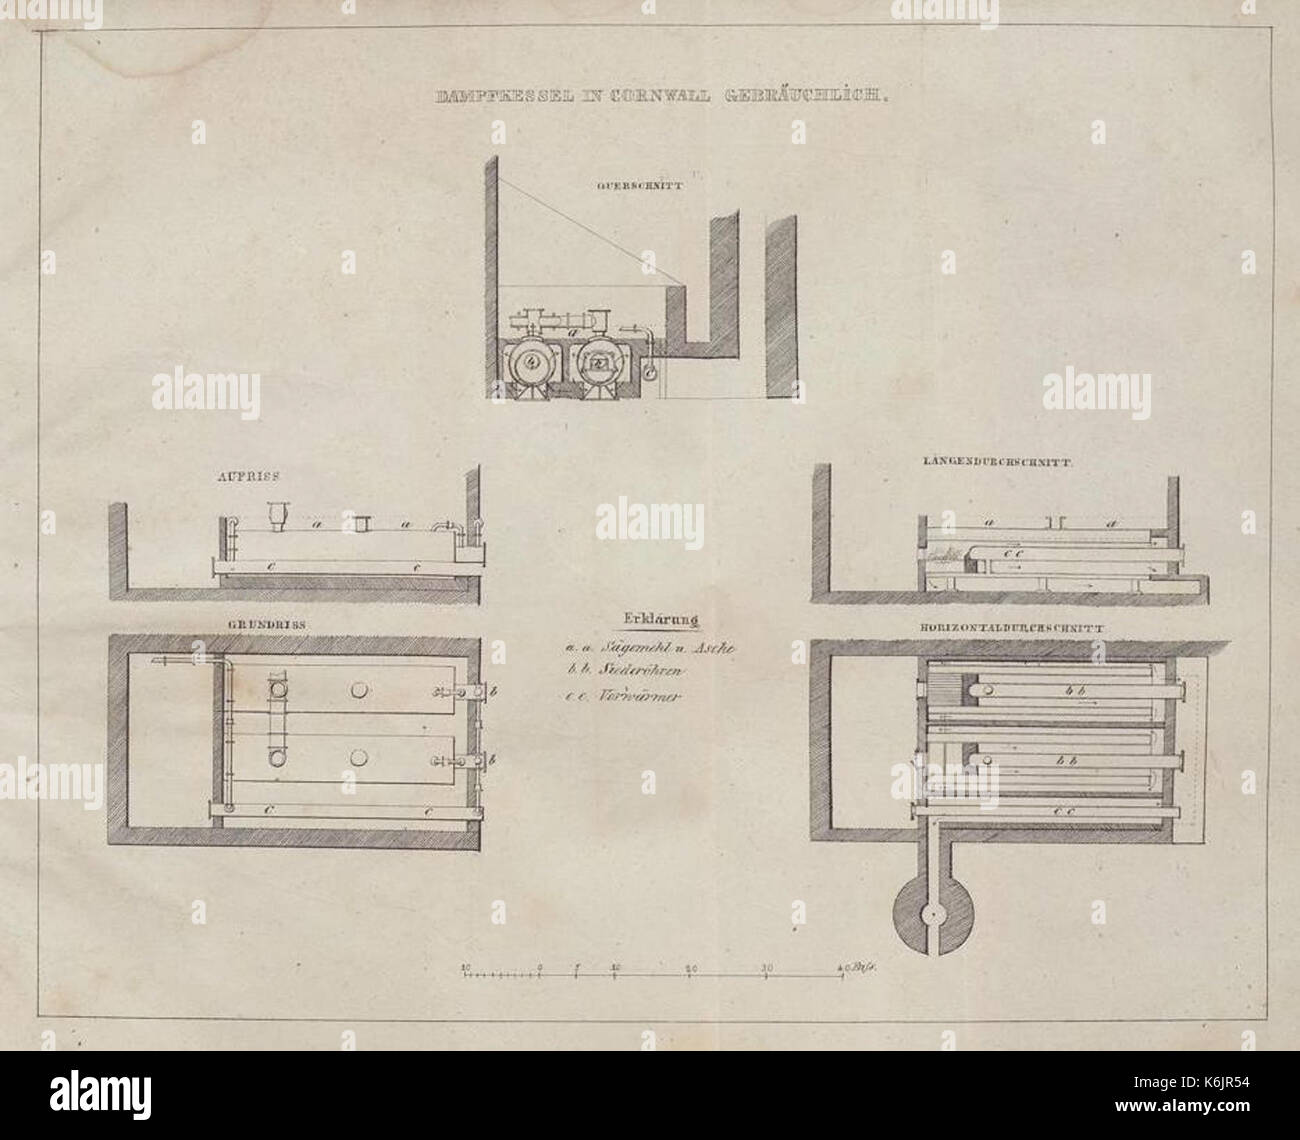 Berühmt Wie Funktionieren Dampfkessel Ideen - Elektrische Schaltplan ...